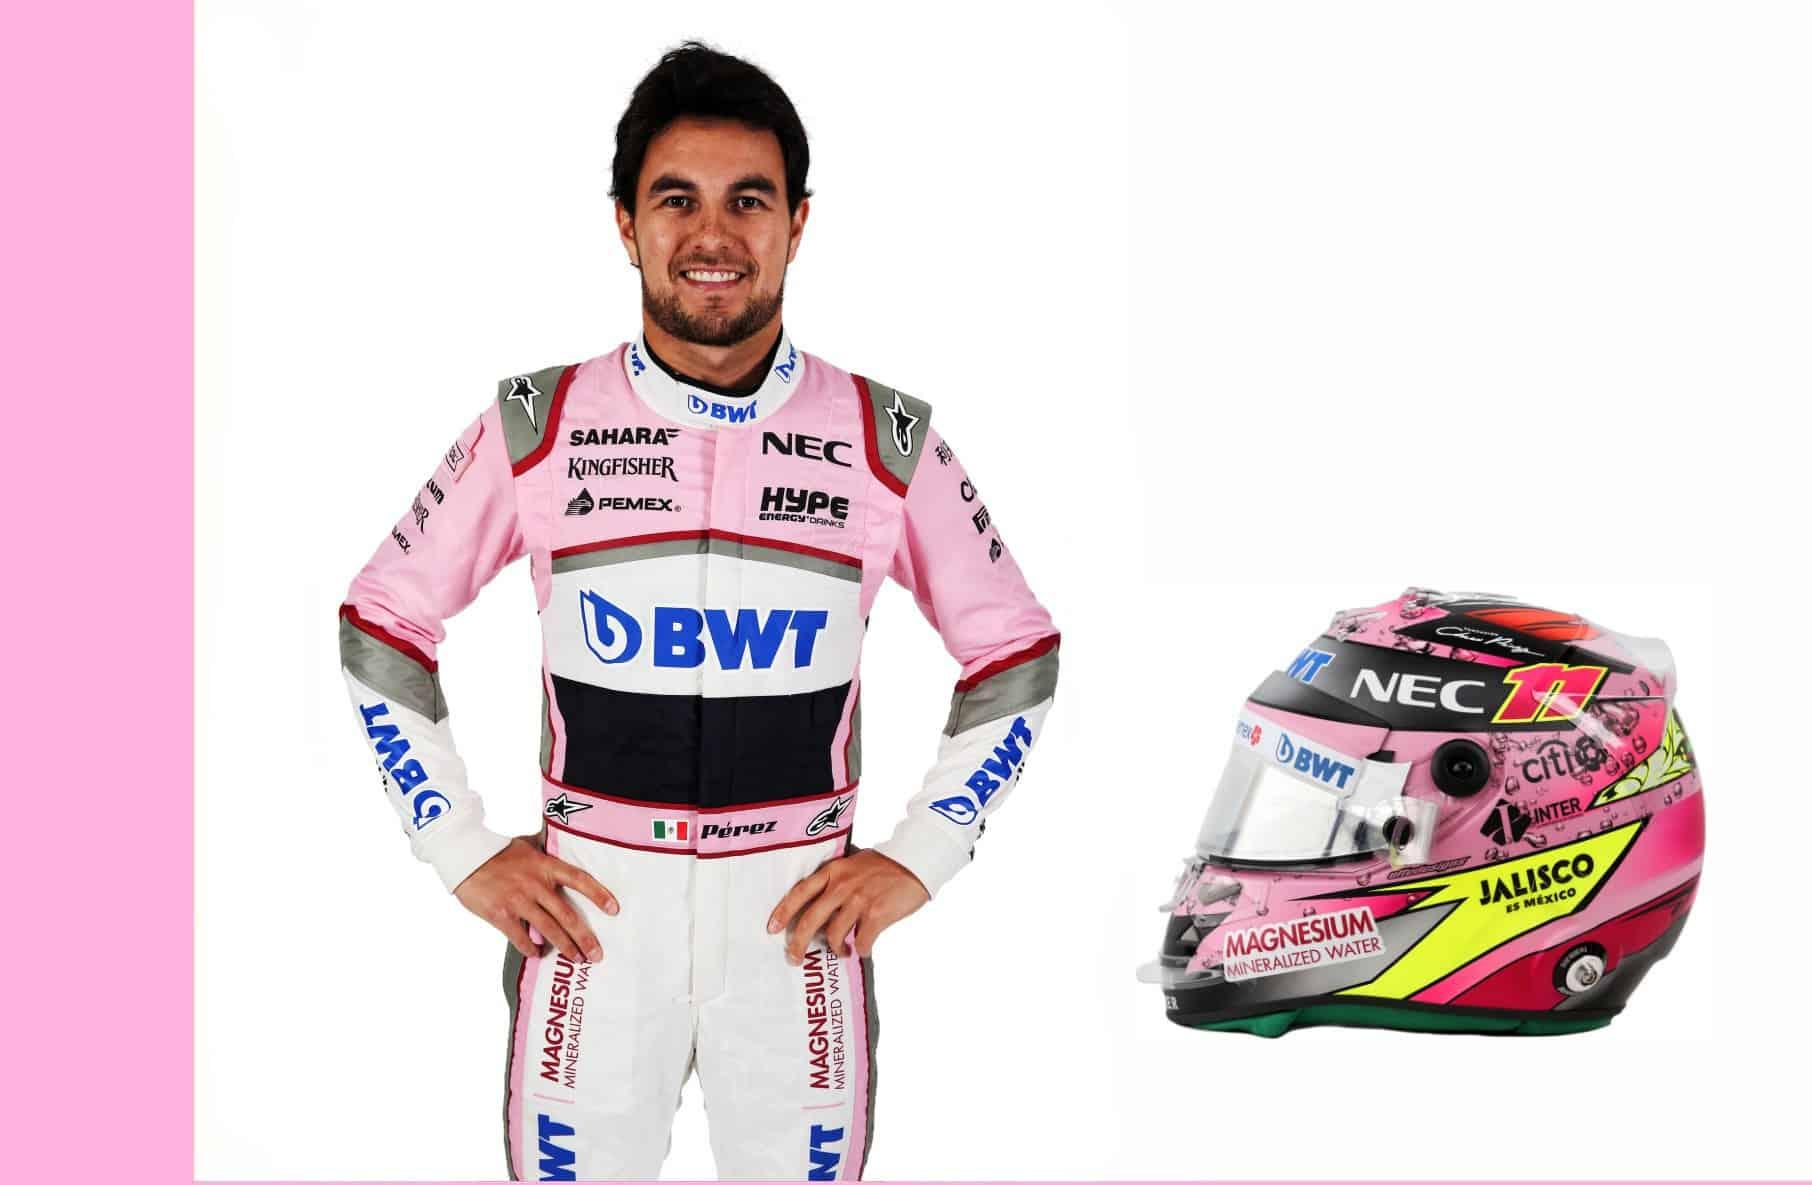 Sergio Perez Force India driver portrait and helmet F1 2018